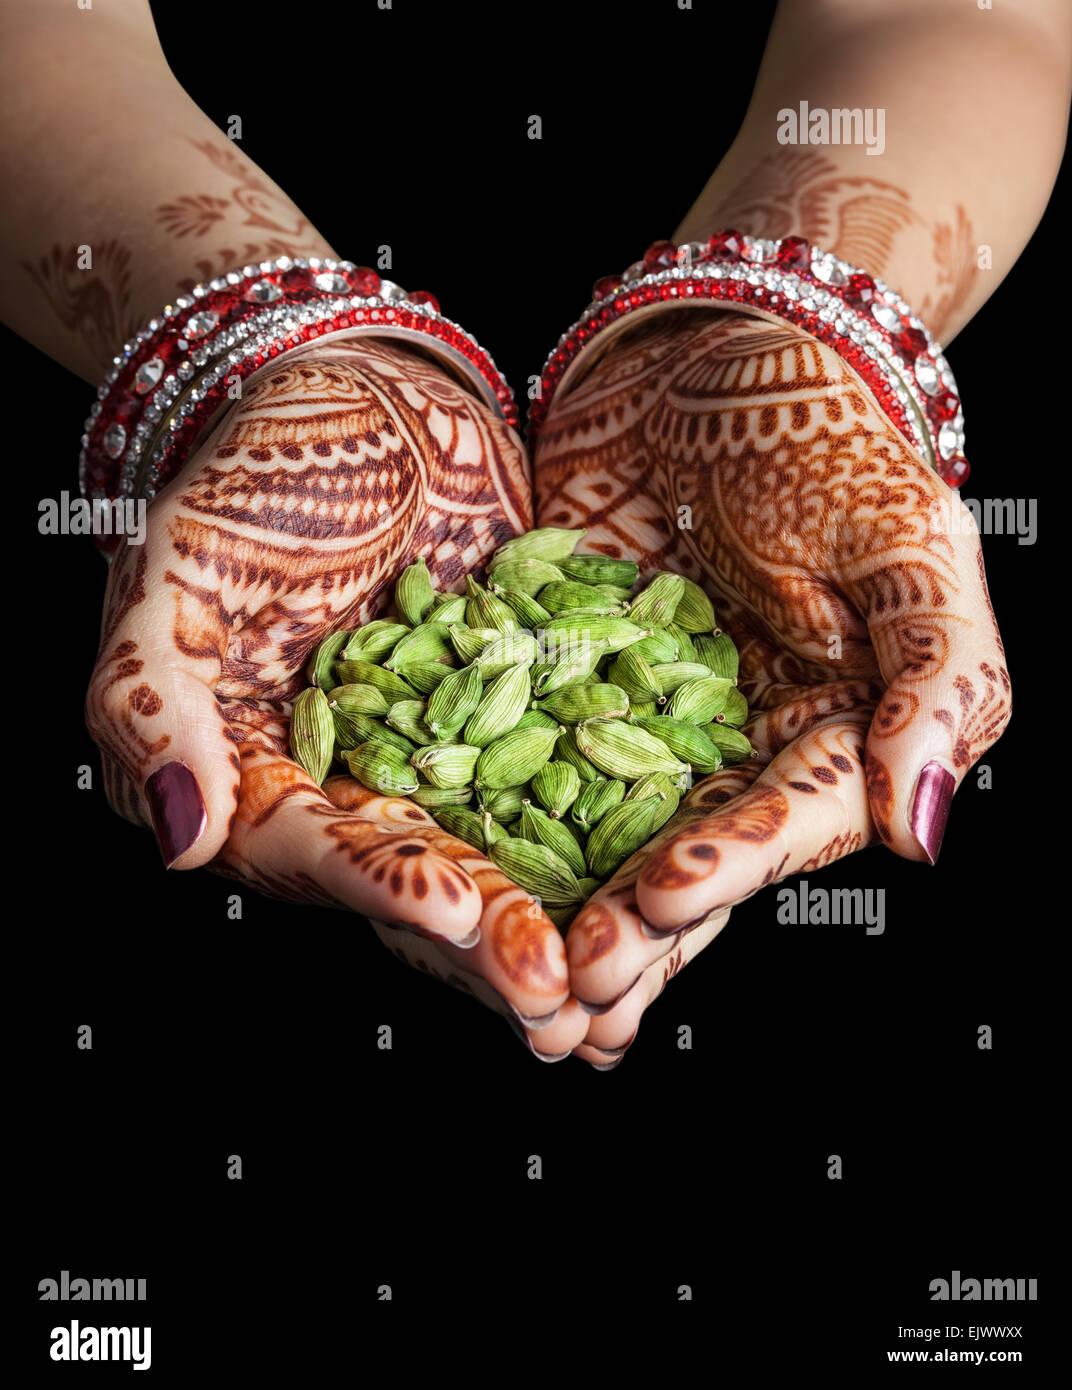 Mujer de manos con henna celebración cardamomo verde especias aislado sobre fondo negro con trazado de recorte Imagen De Stock